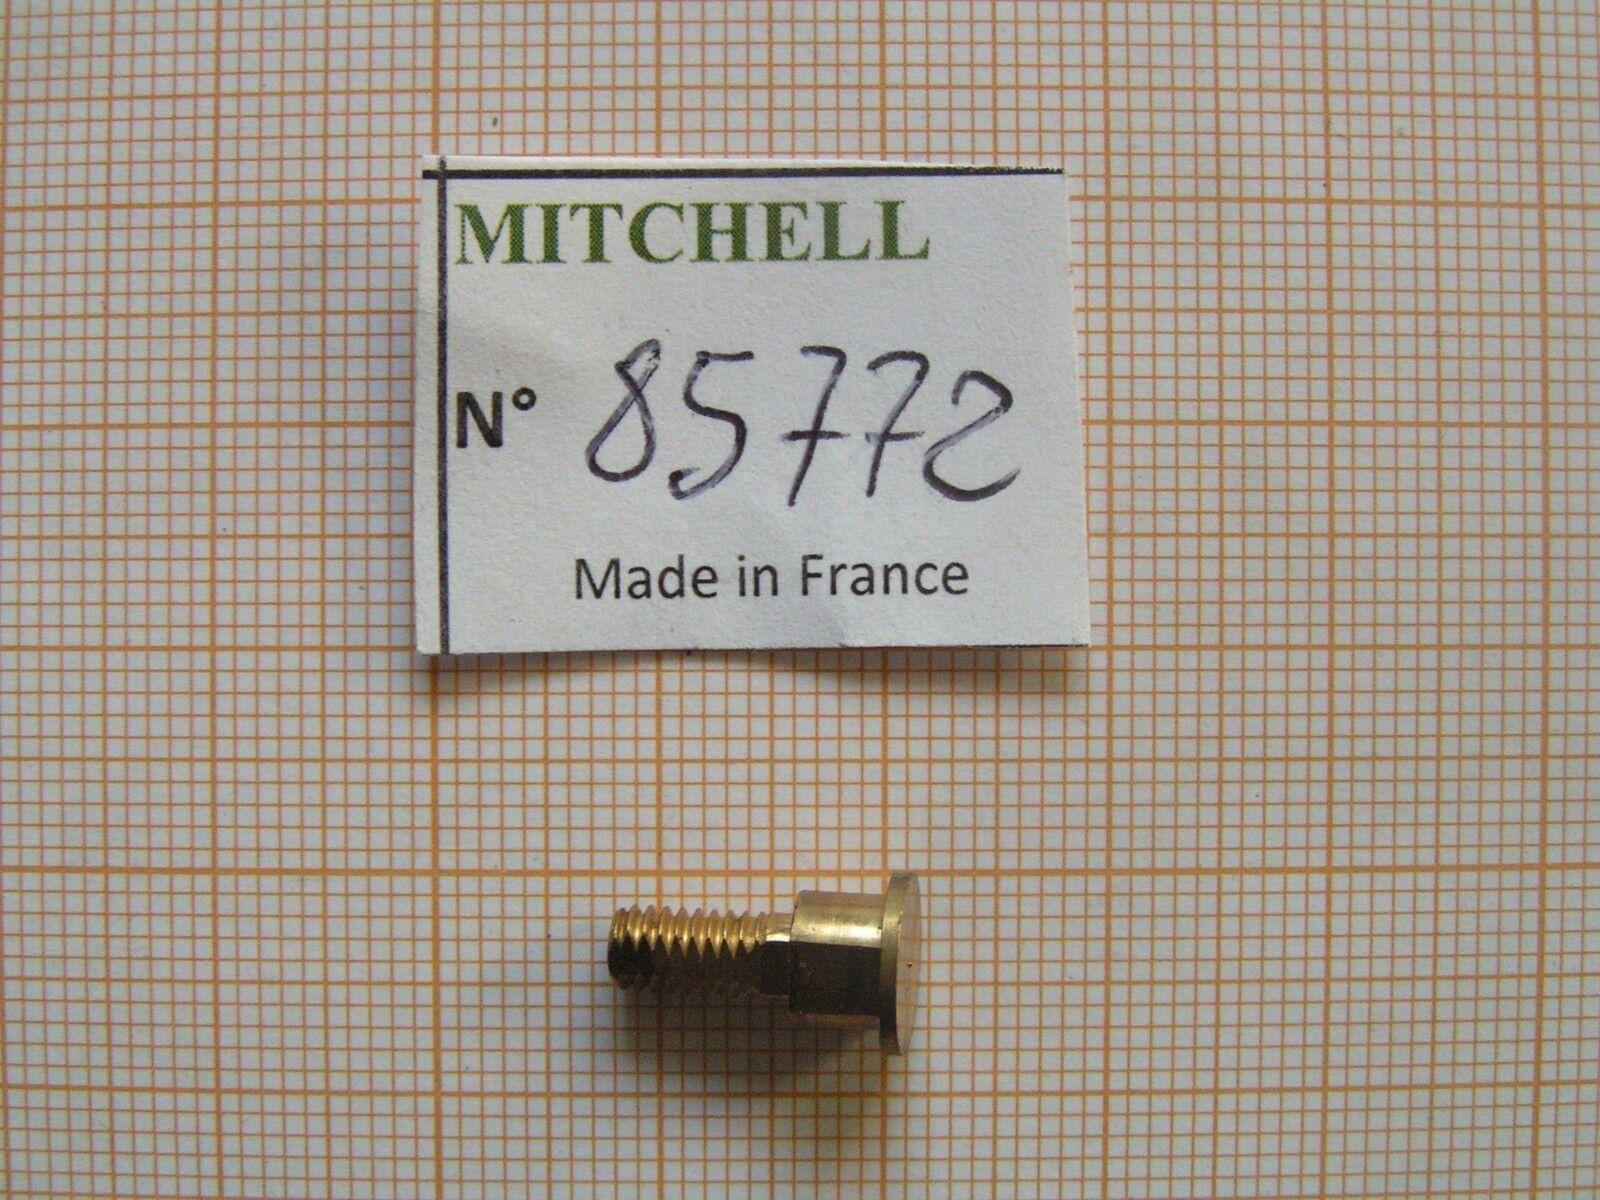 KIT PIGNON MOULINET MITCHELL ORCA 7000 SCPRO MULINELLO CARRETE REEL PART 181721